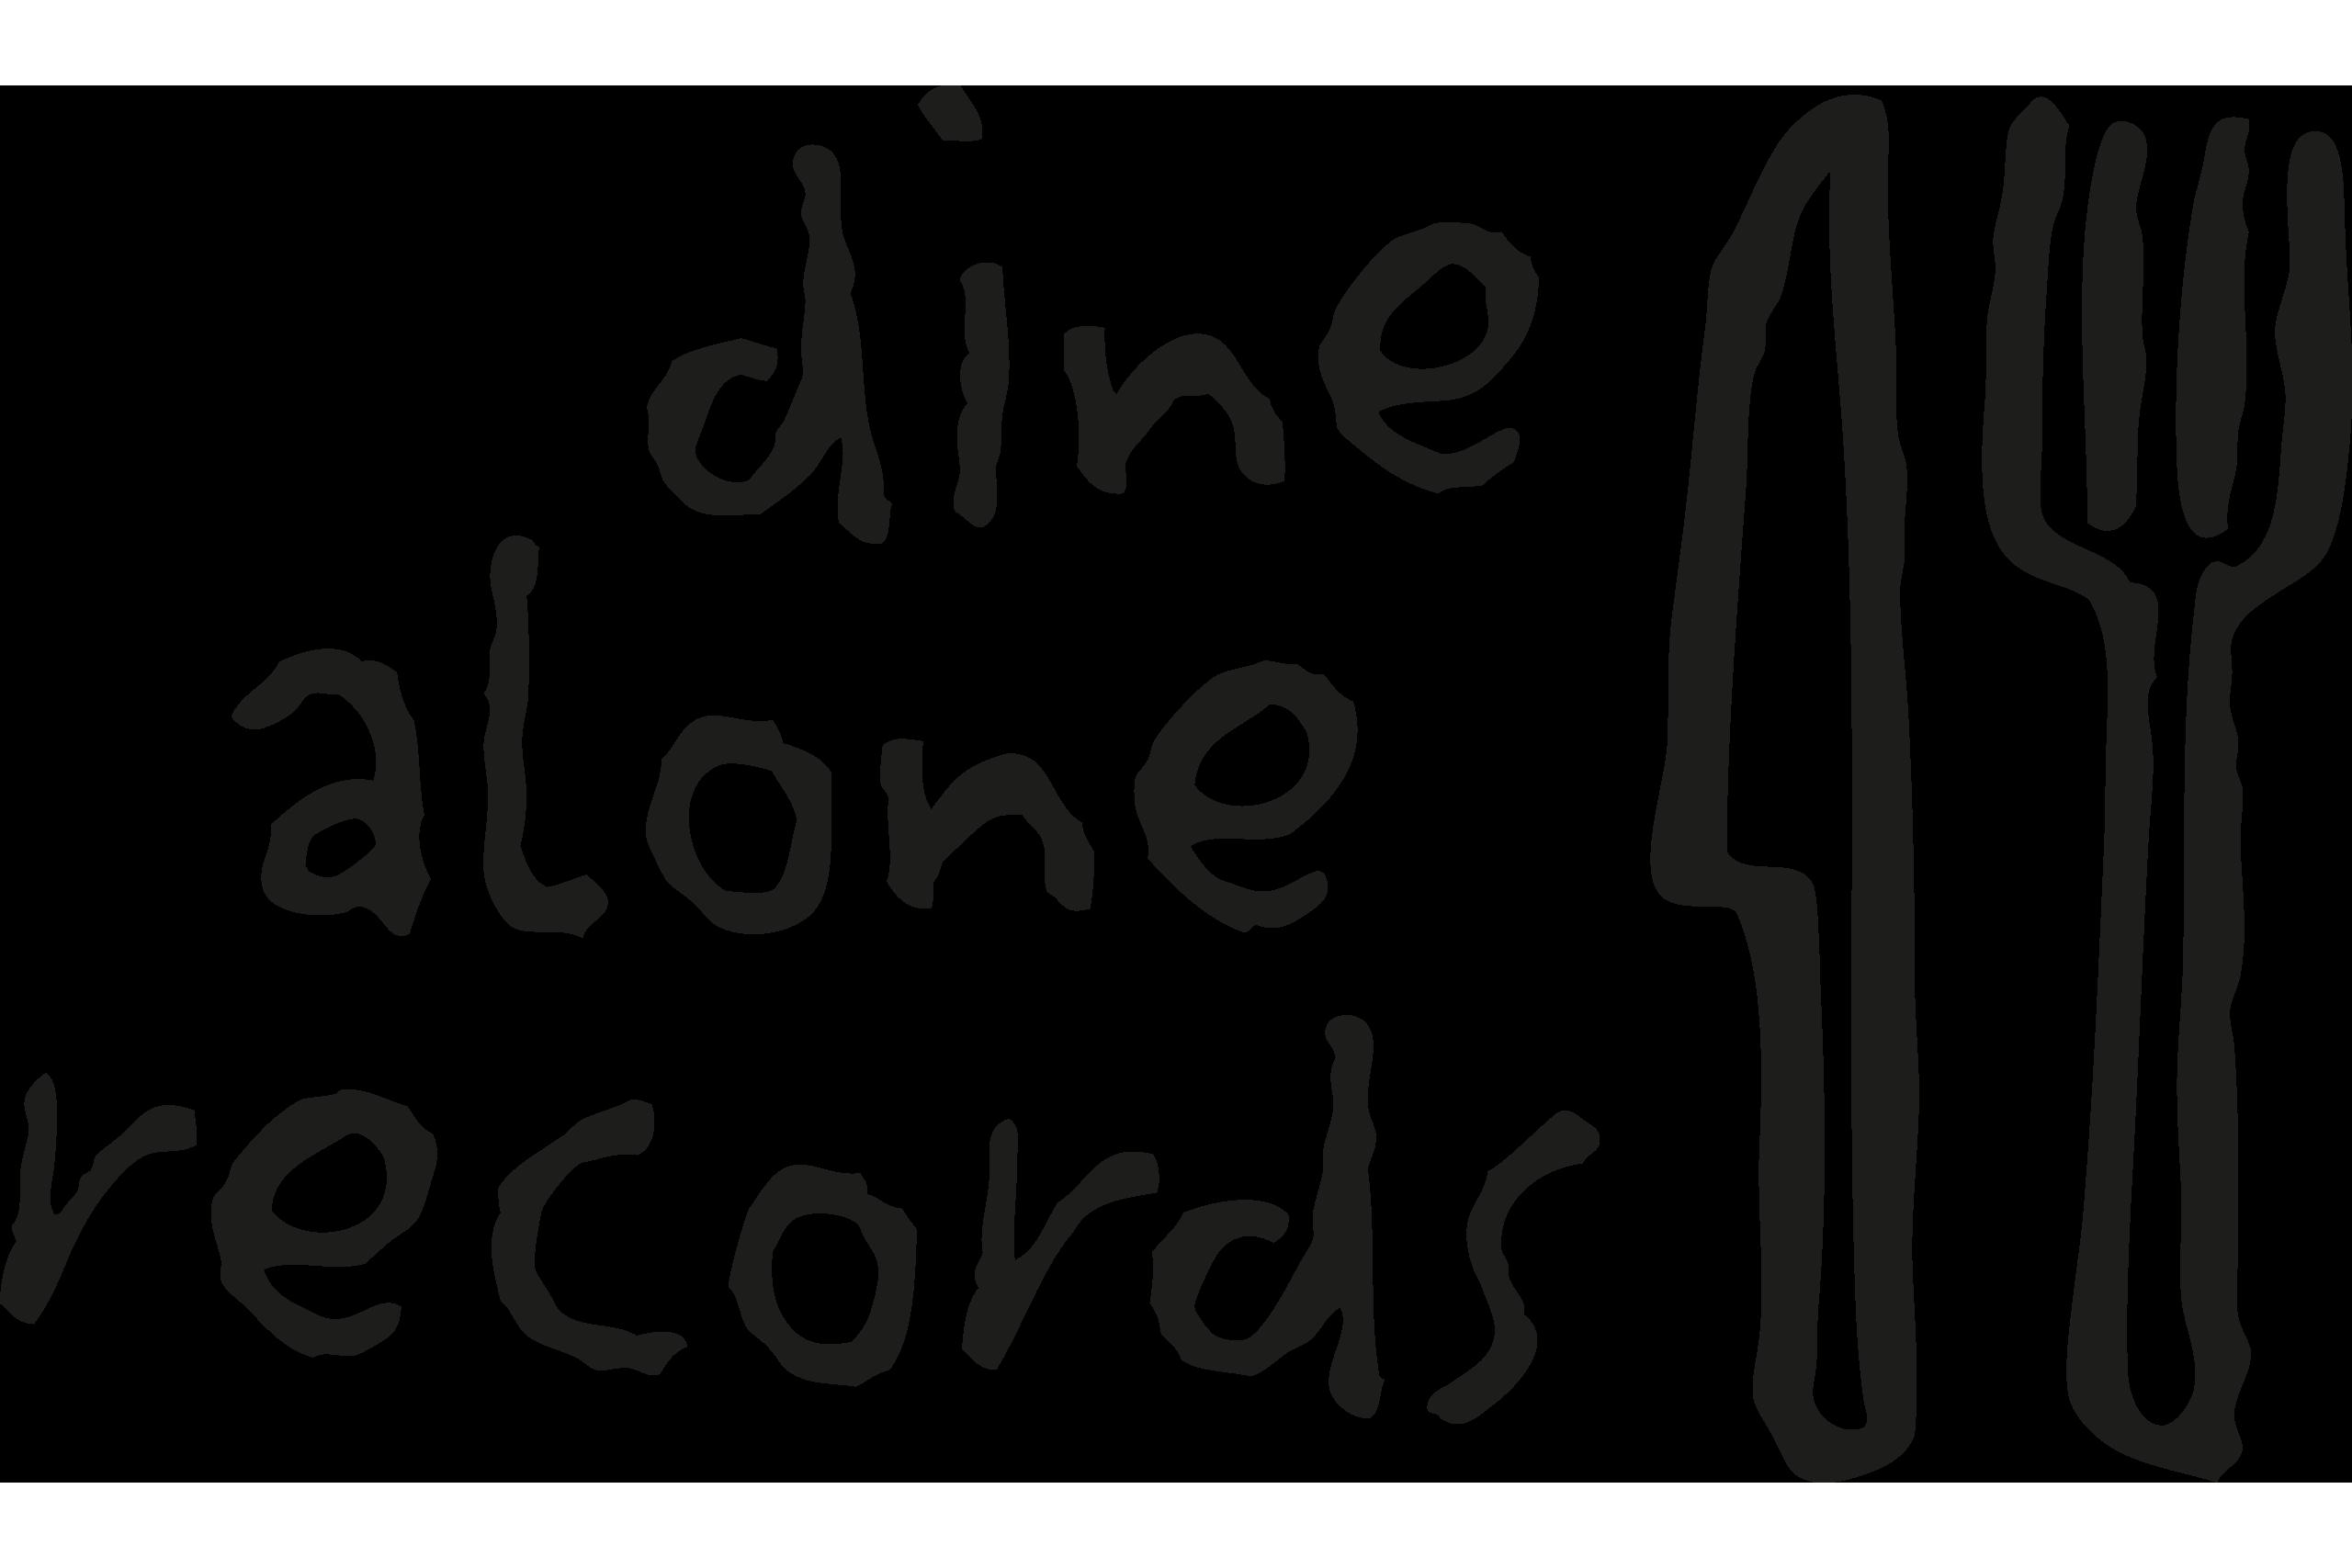 DINEALONE-LOGO